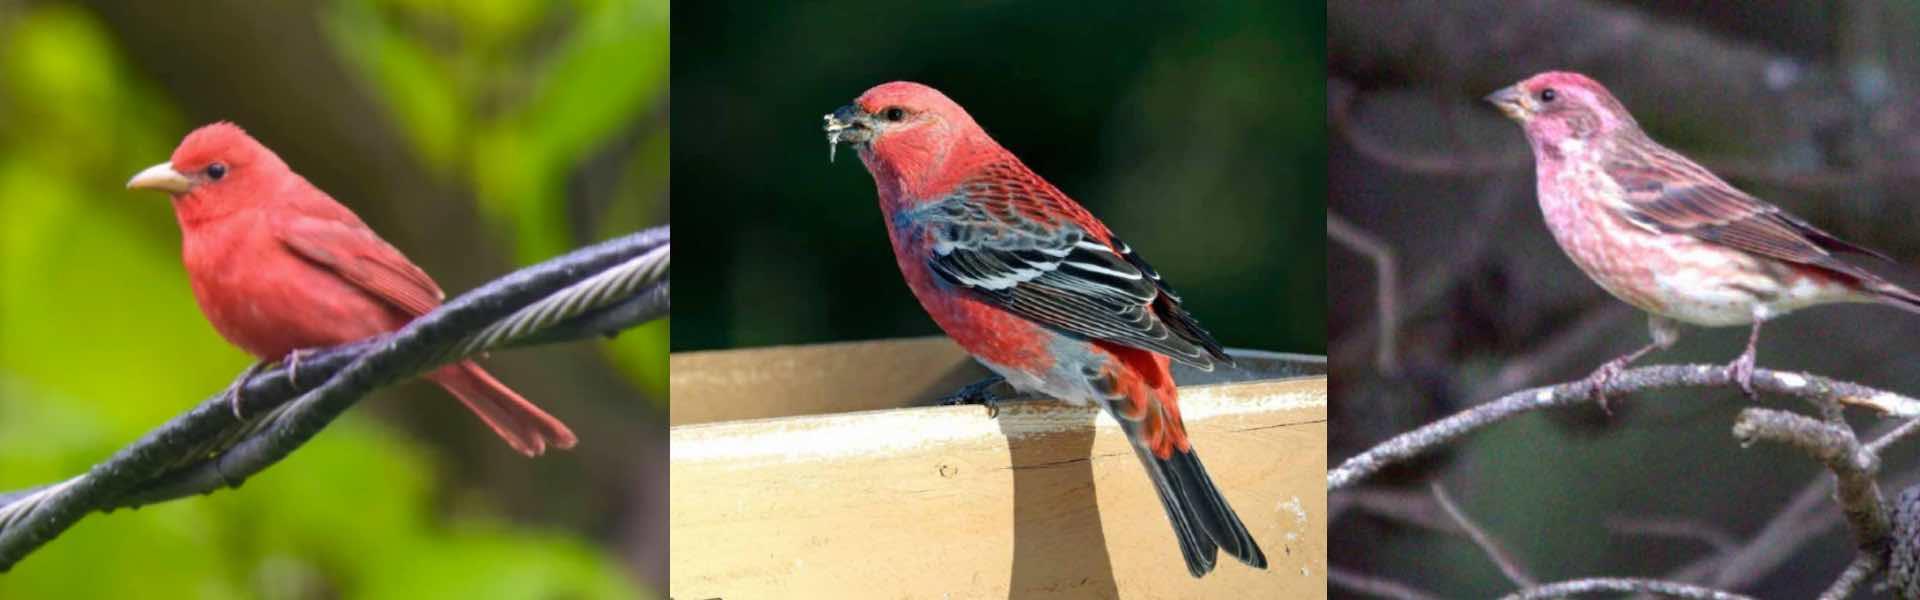 3 birds that look like cardinals